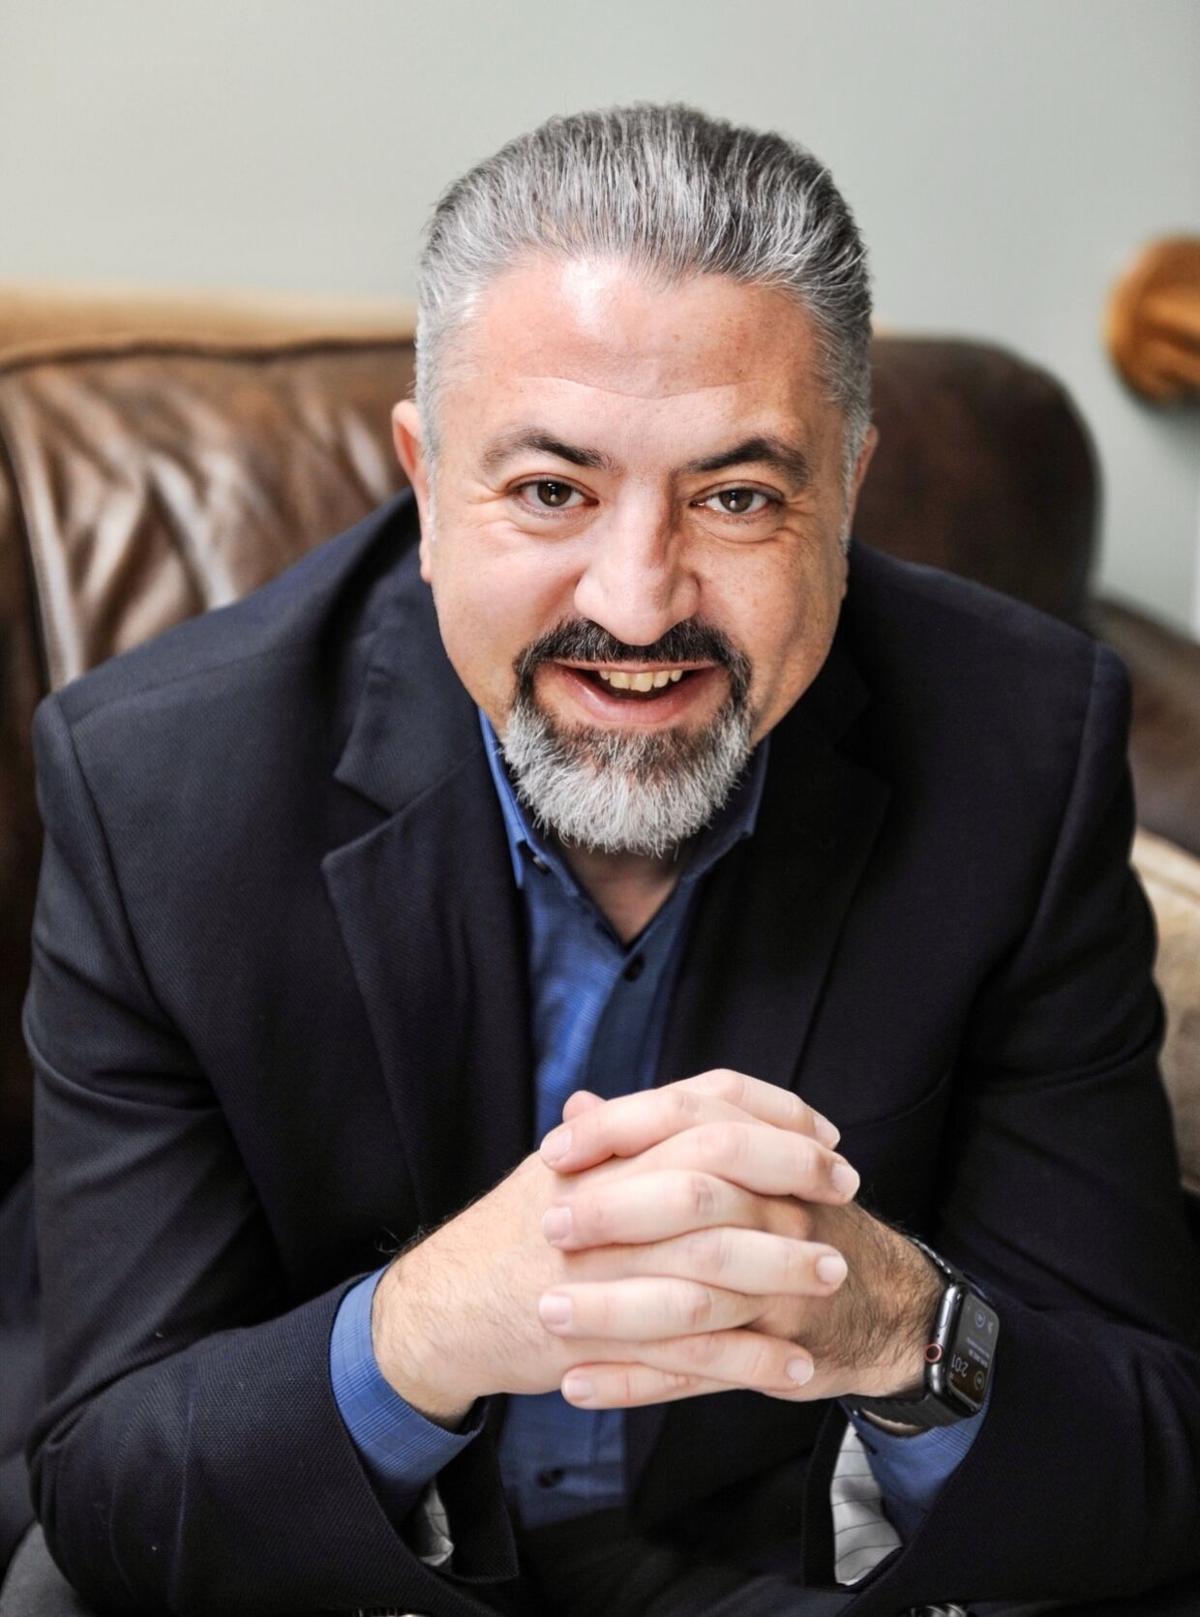 MORE: Delegate David Ramadan won't seek re-election